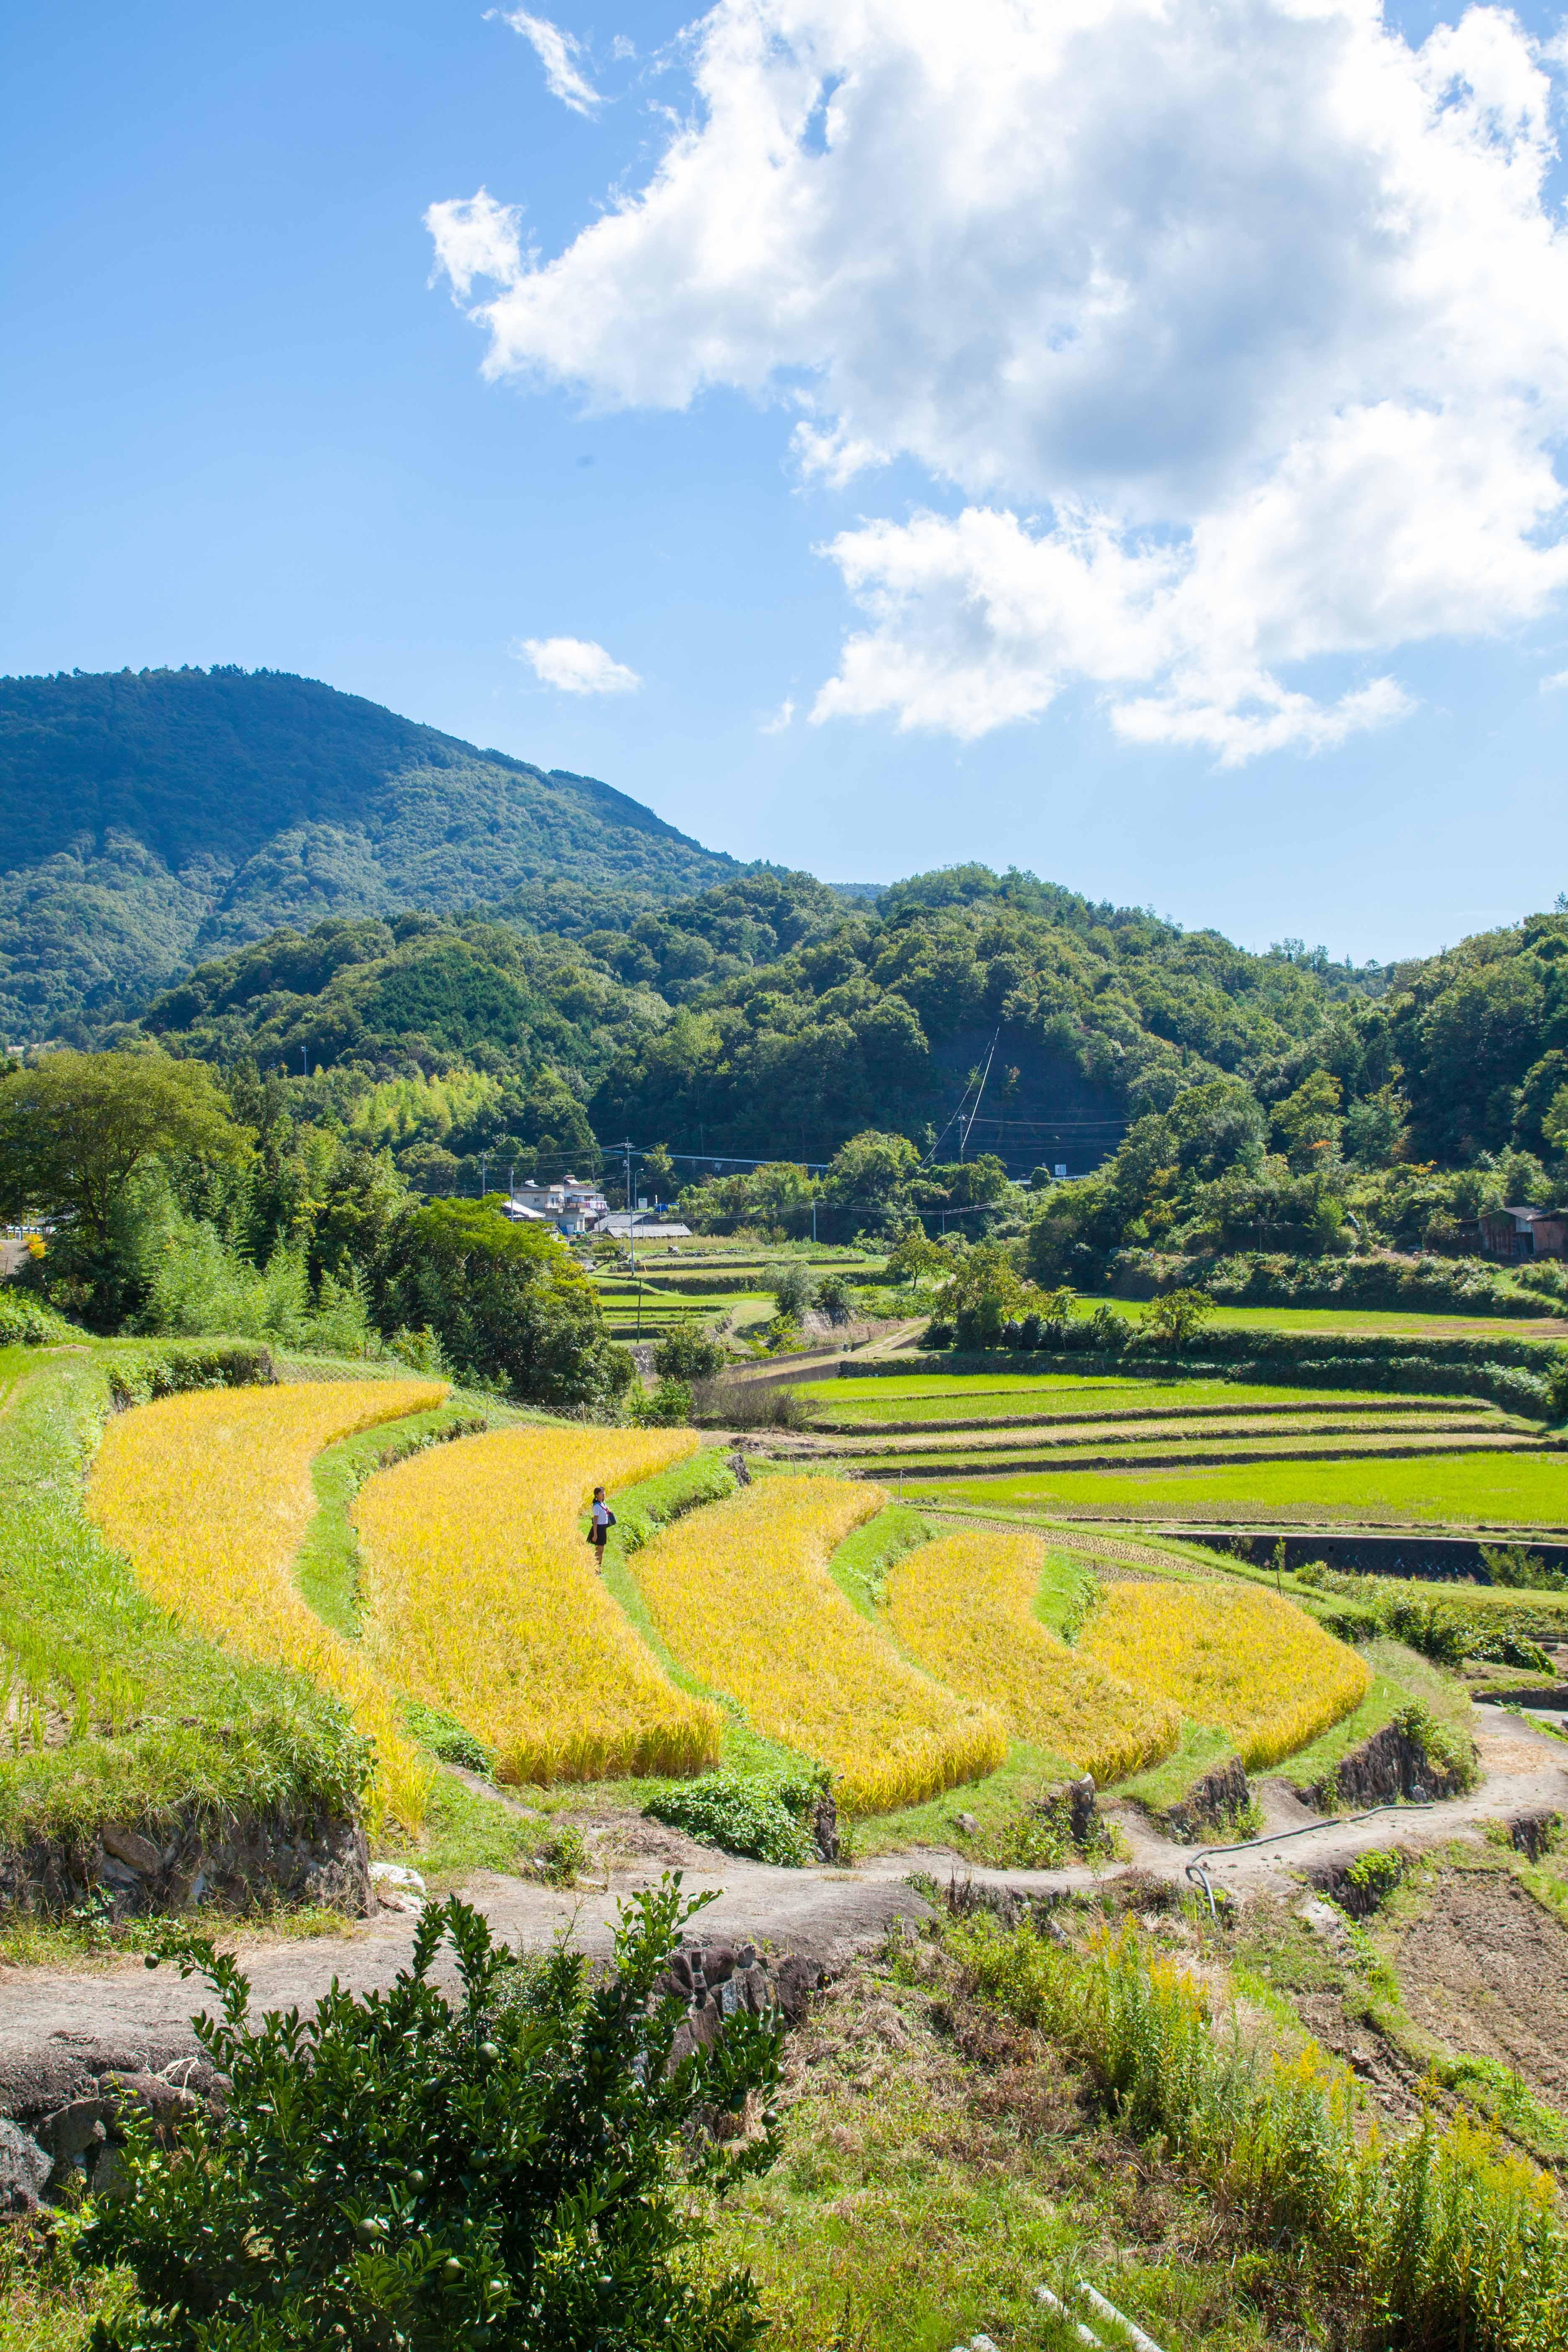 小豆島 香川県 Shodo Island , Kagawa Prefecture